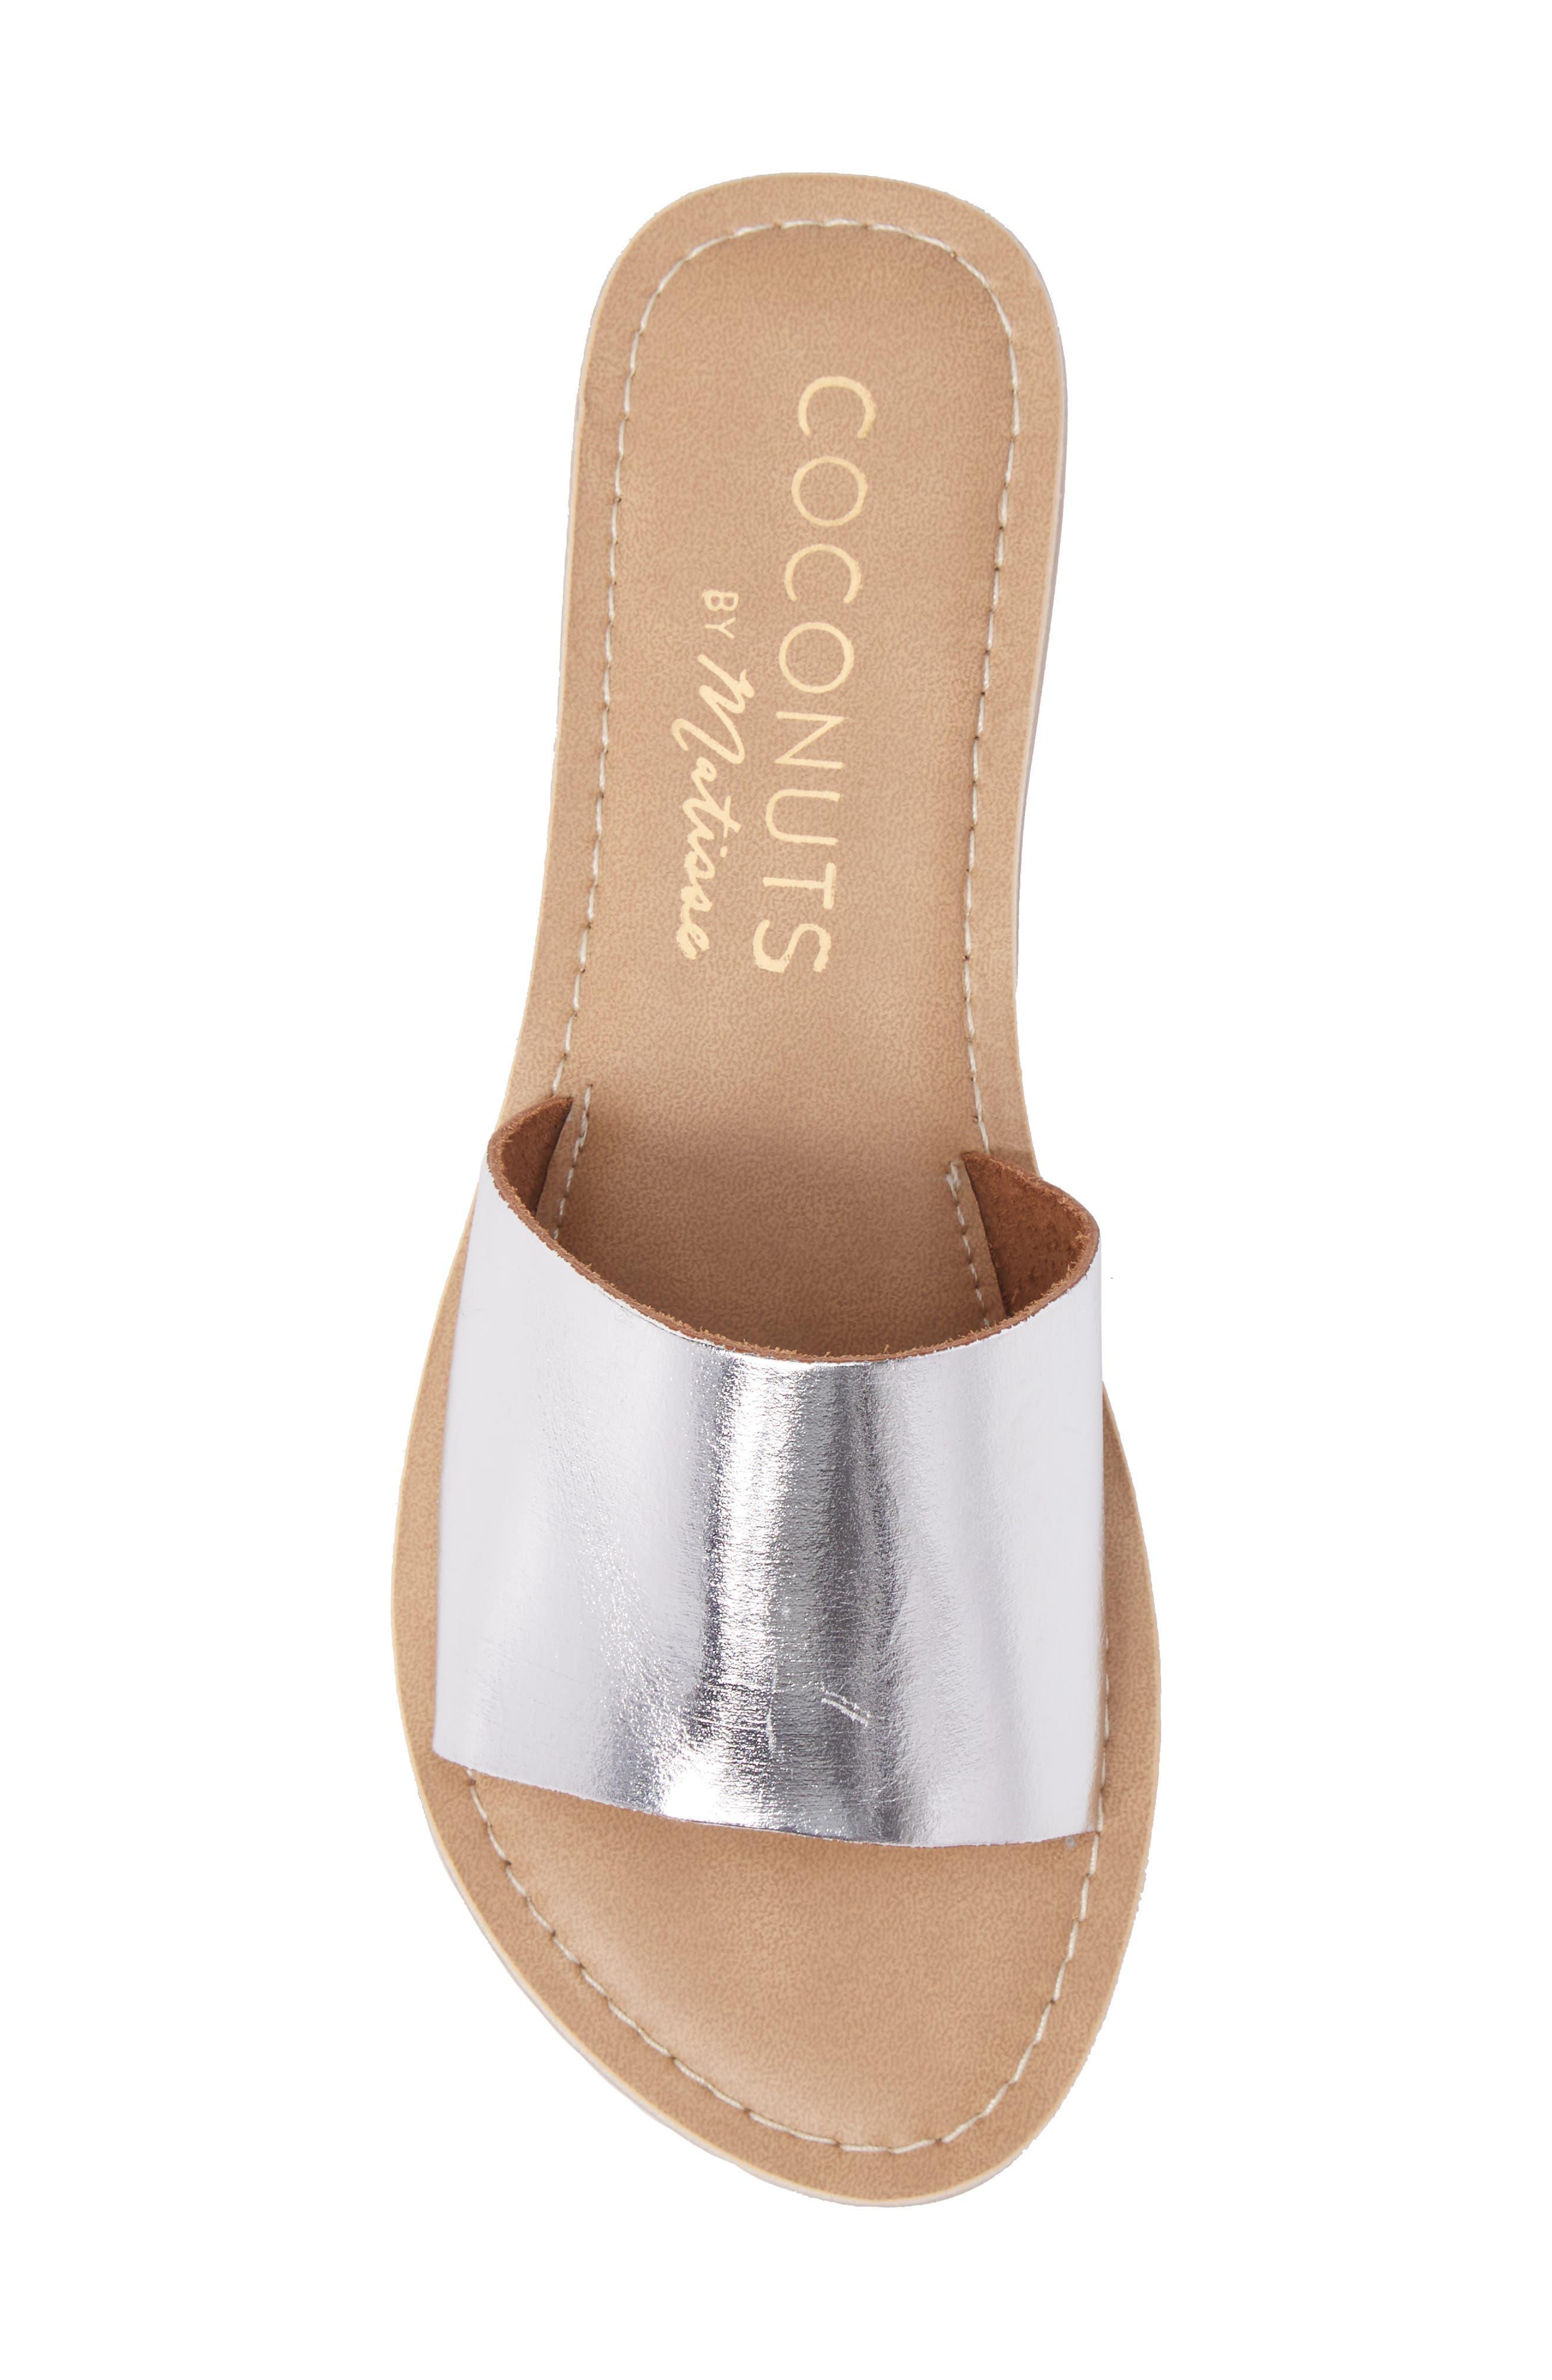 Cabana Slide Sandal,                             Alternate thumbnail 5, color,                             Silver Leather